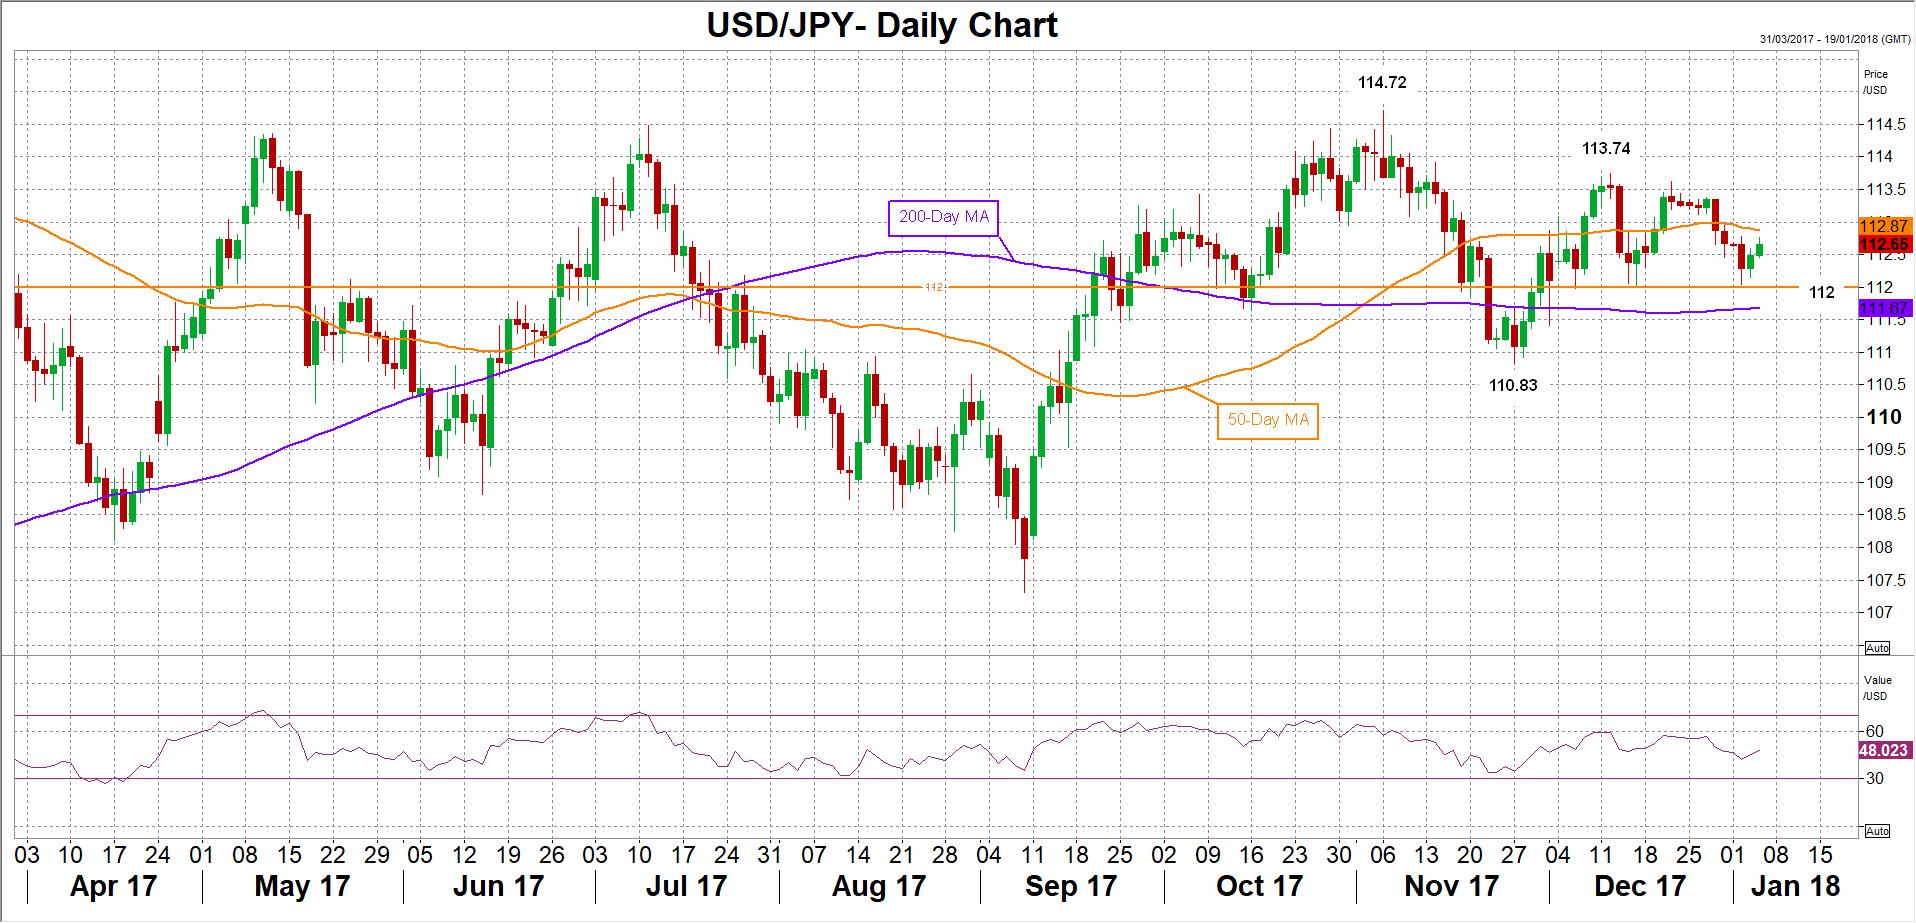 USD/JPY 04/01/2018 | Econ Alerts